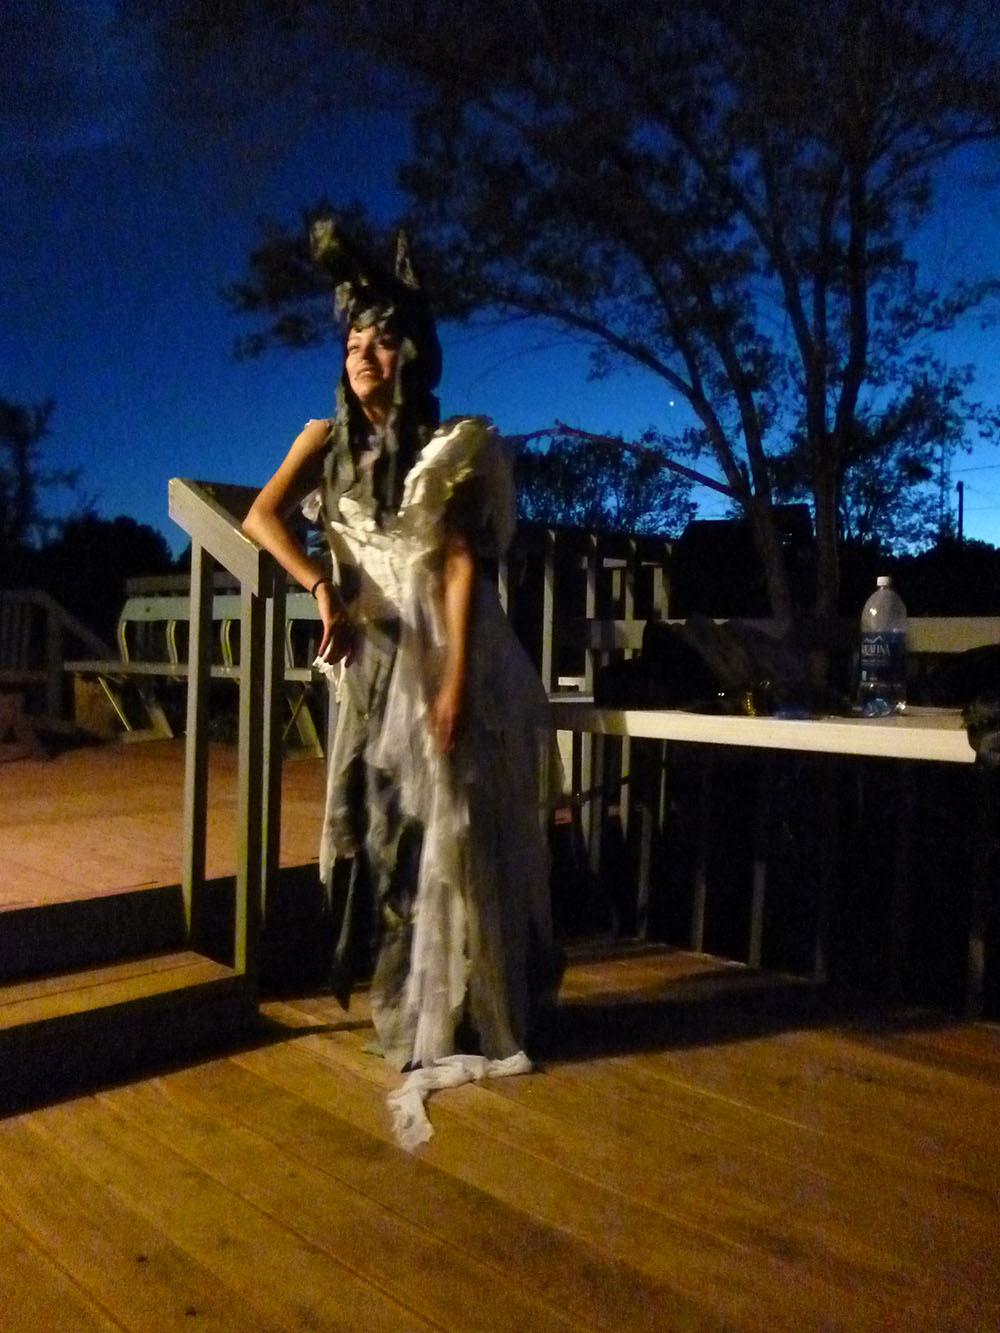 MT, Wolf dress.